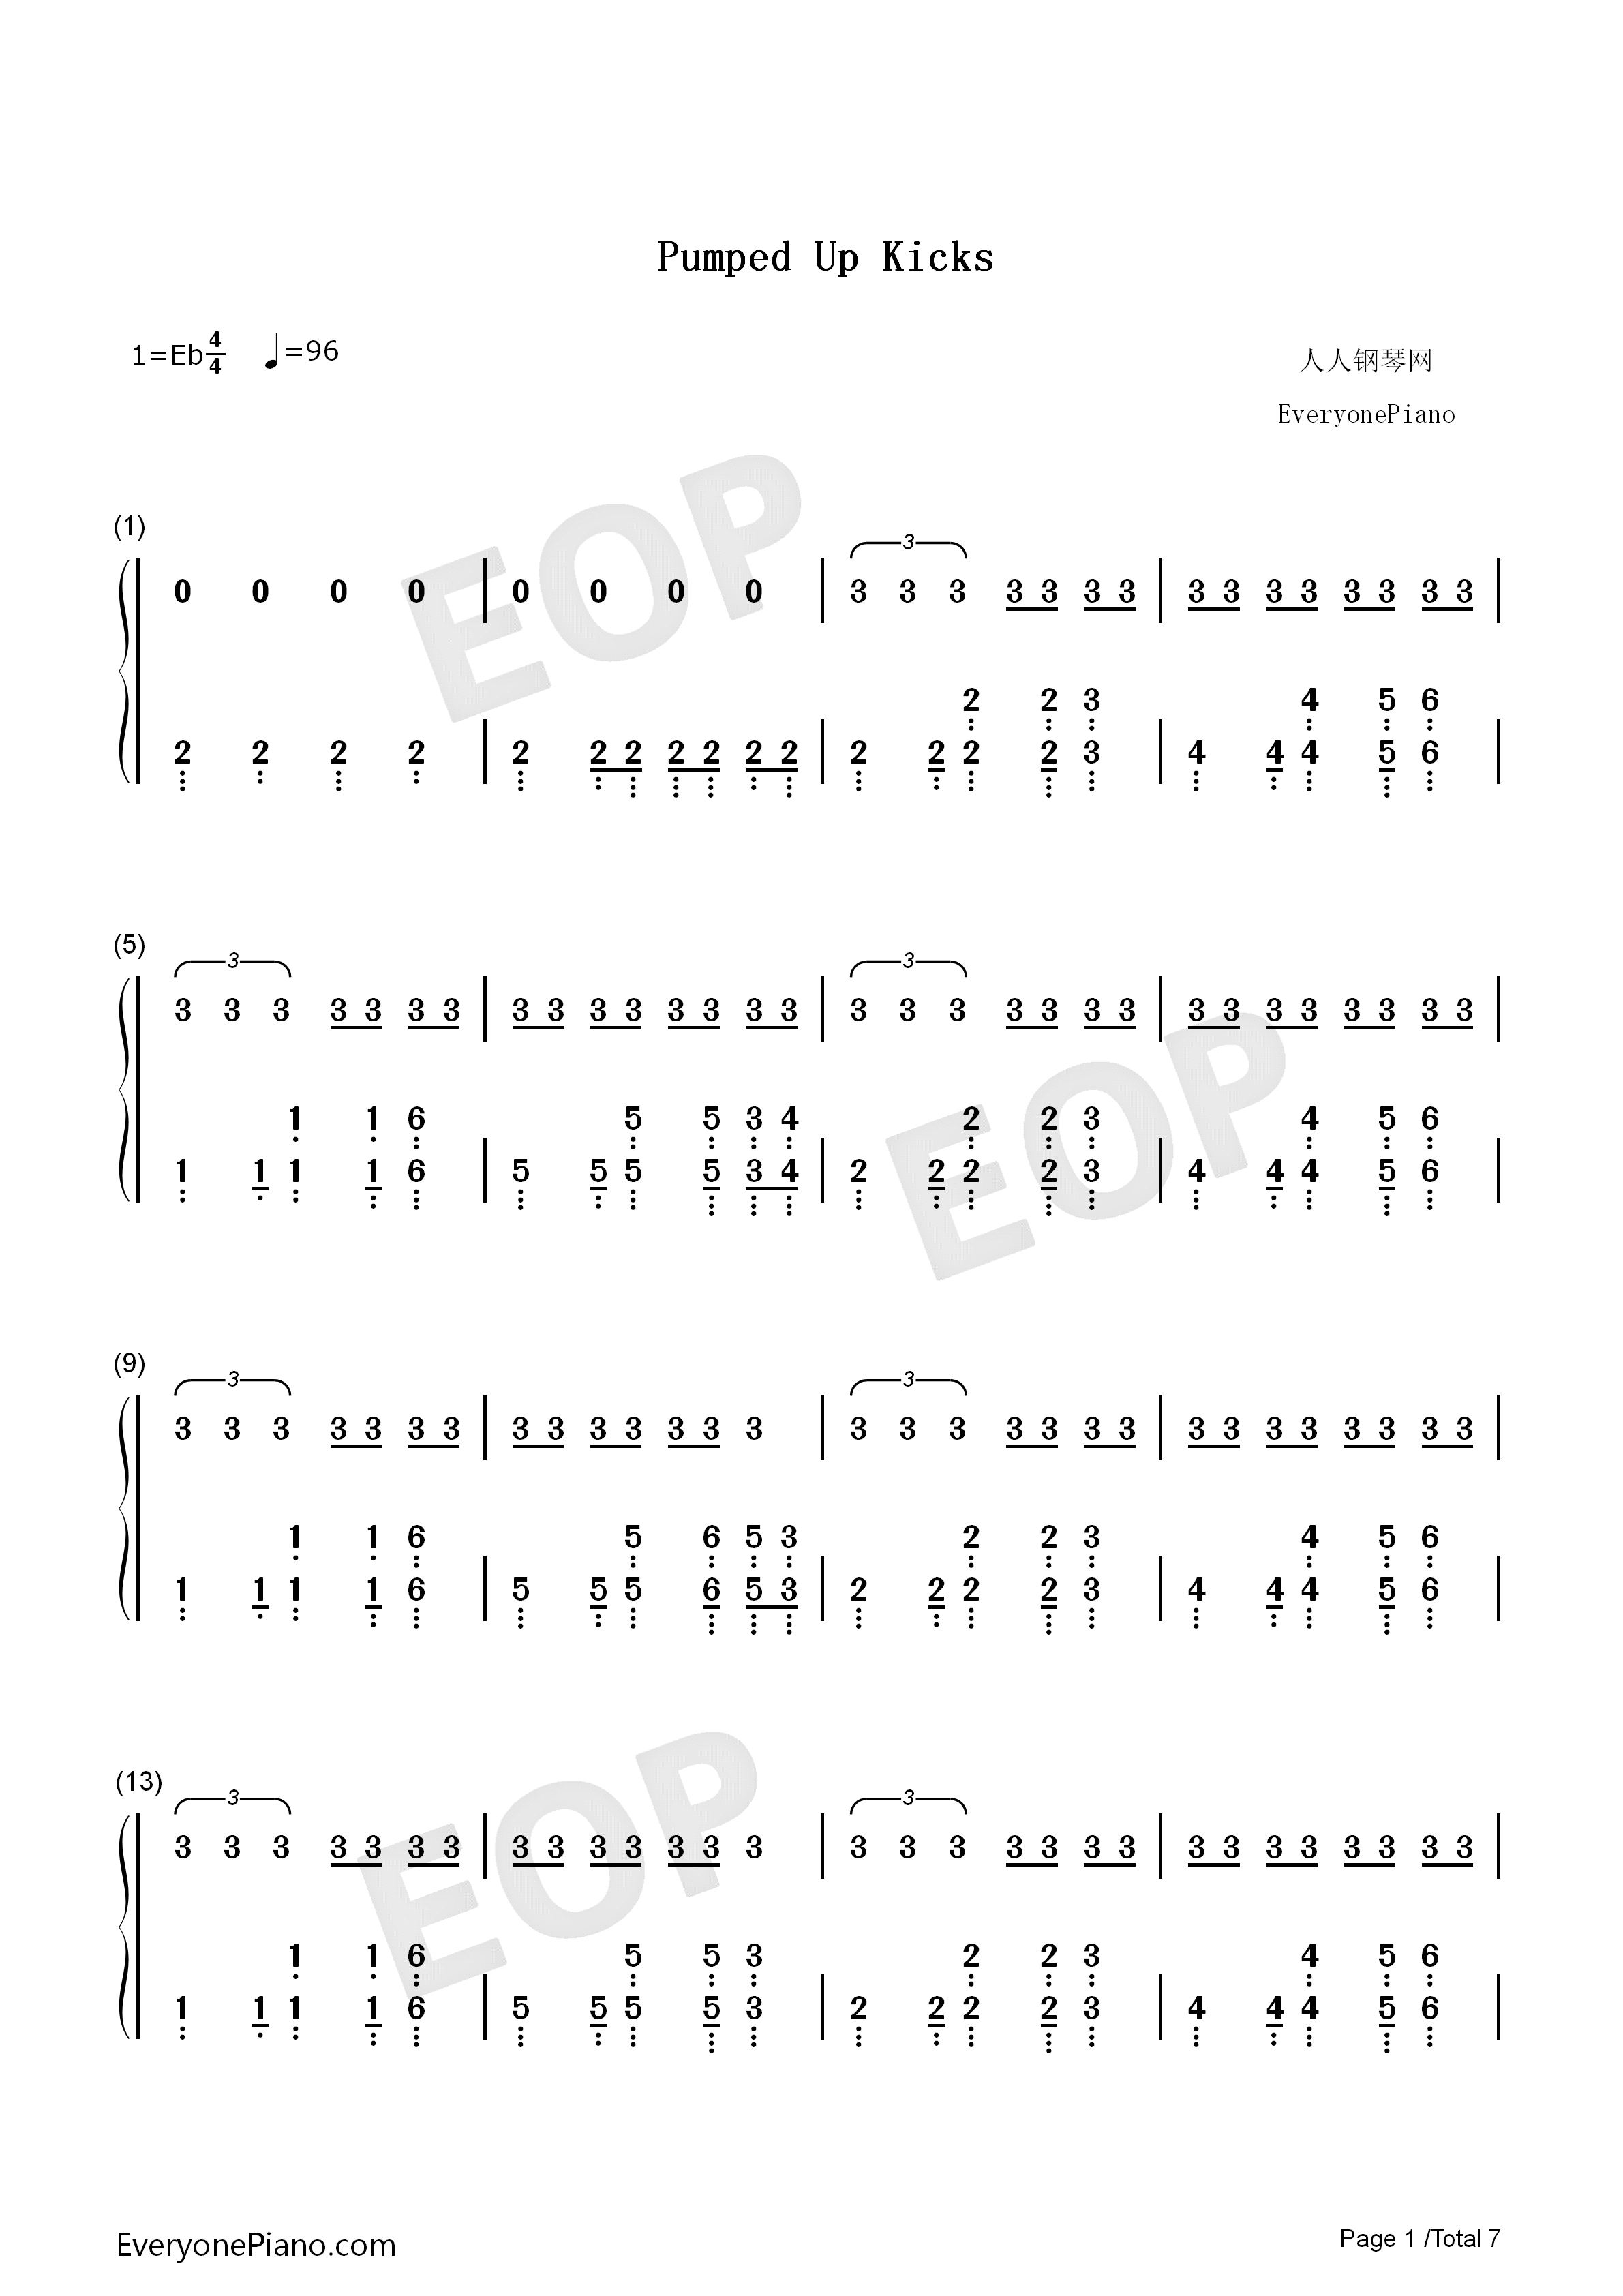 Pumped Up Kicks Chords Pumped Up Kicks Foster The People Free Piano Sheet Music Piano Chords